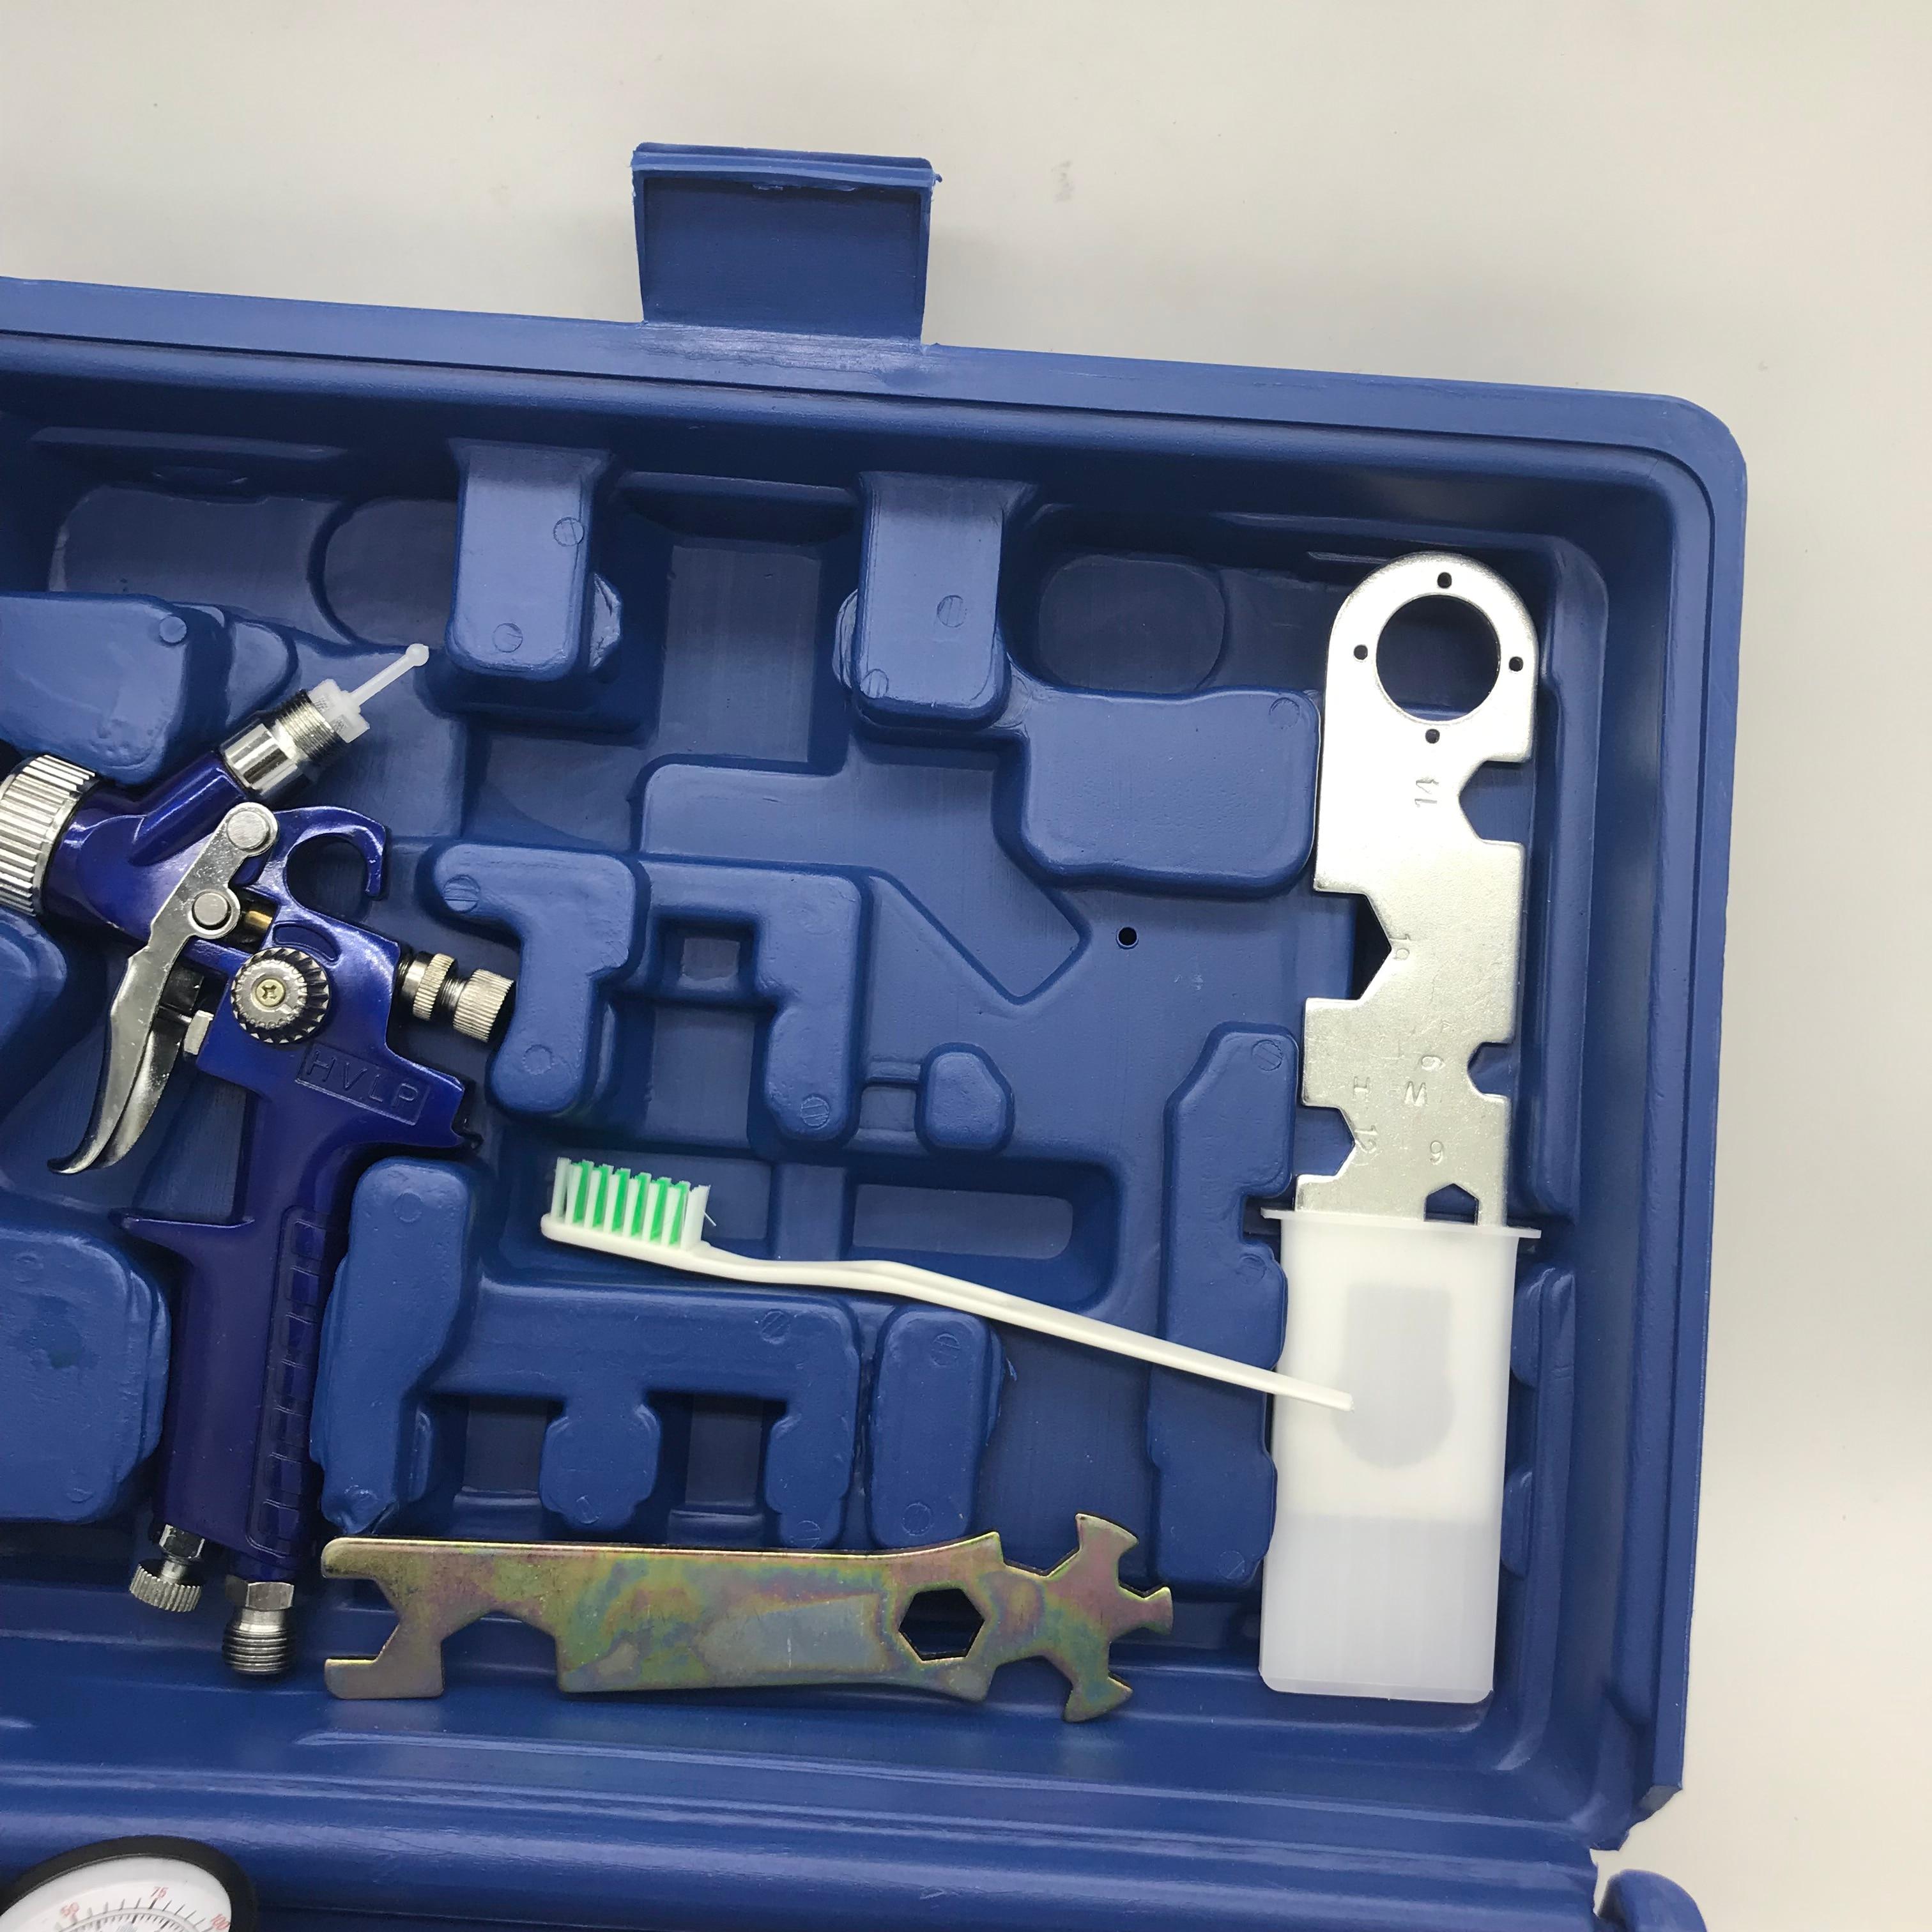 Tools : H827   H2000 spray paint gun with box Airbrush airless spray gun for painting cars Pneumatic tool 1 0 1 4mm